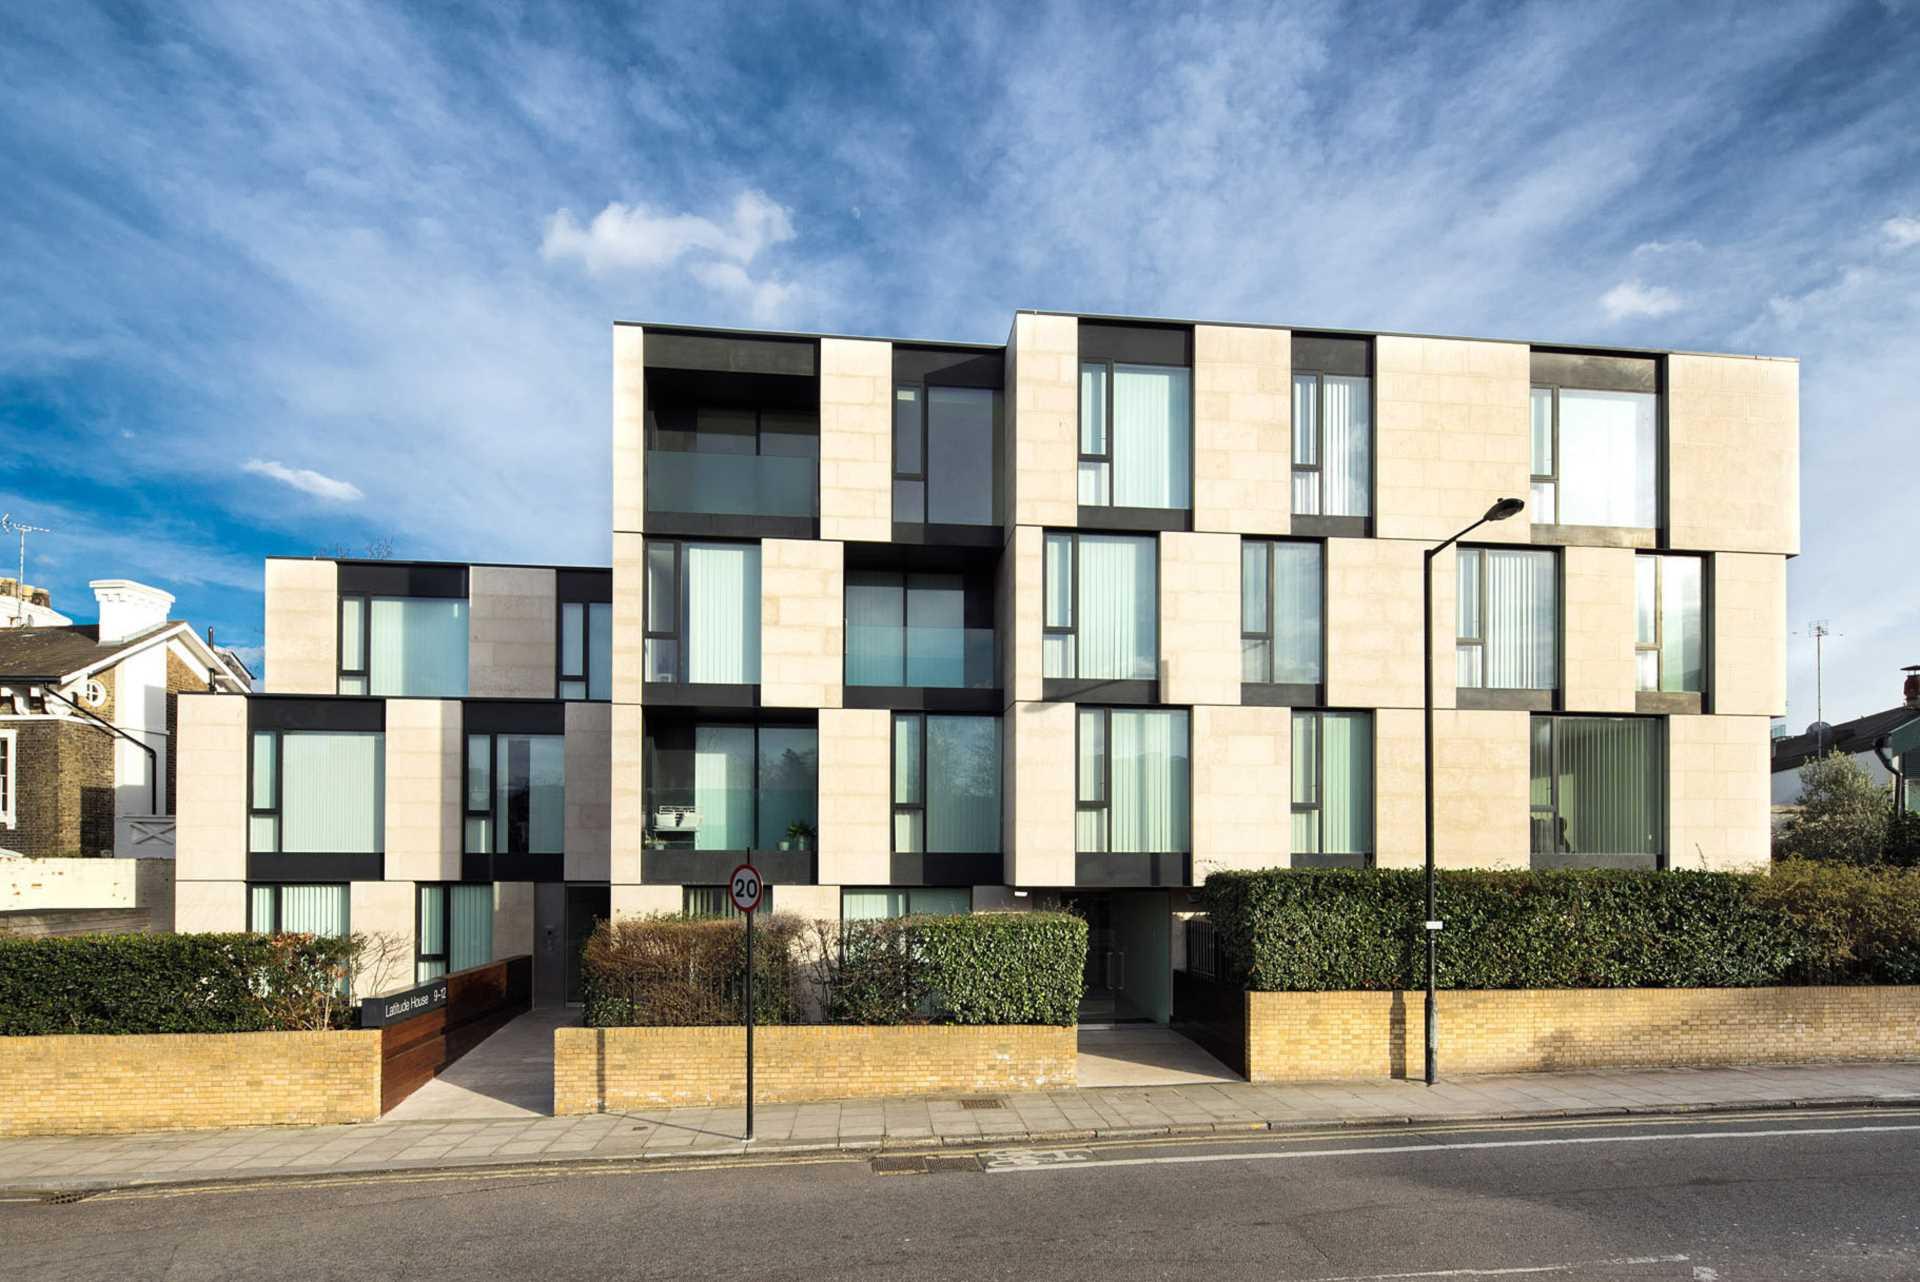 1 Bedroom Flat To Rent Latitude House Primrose Hill London Nw1 7eu